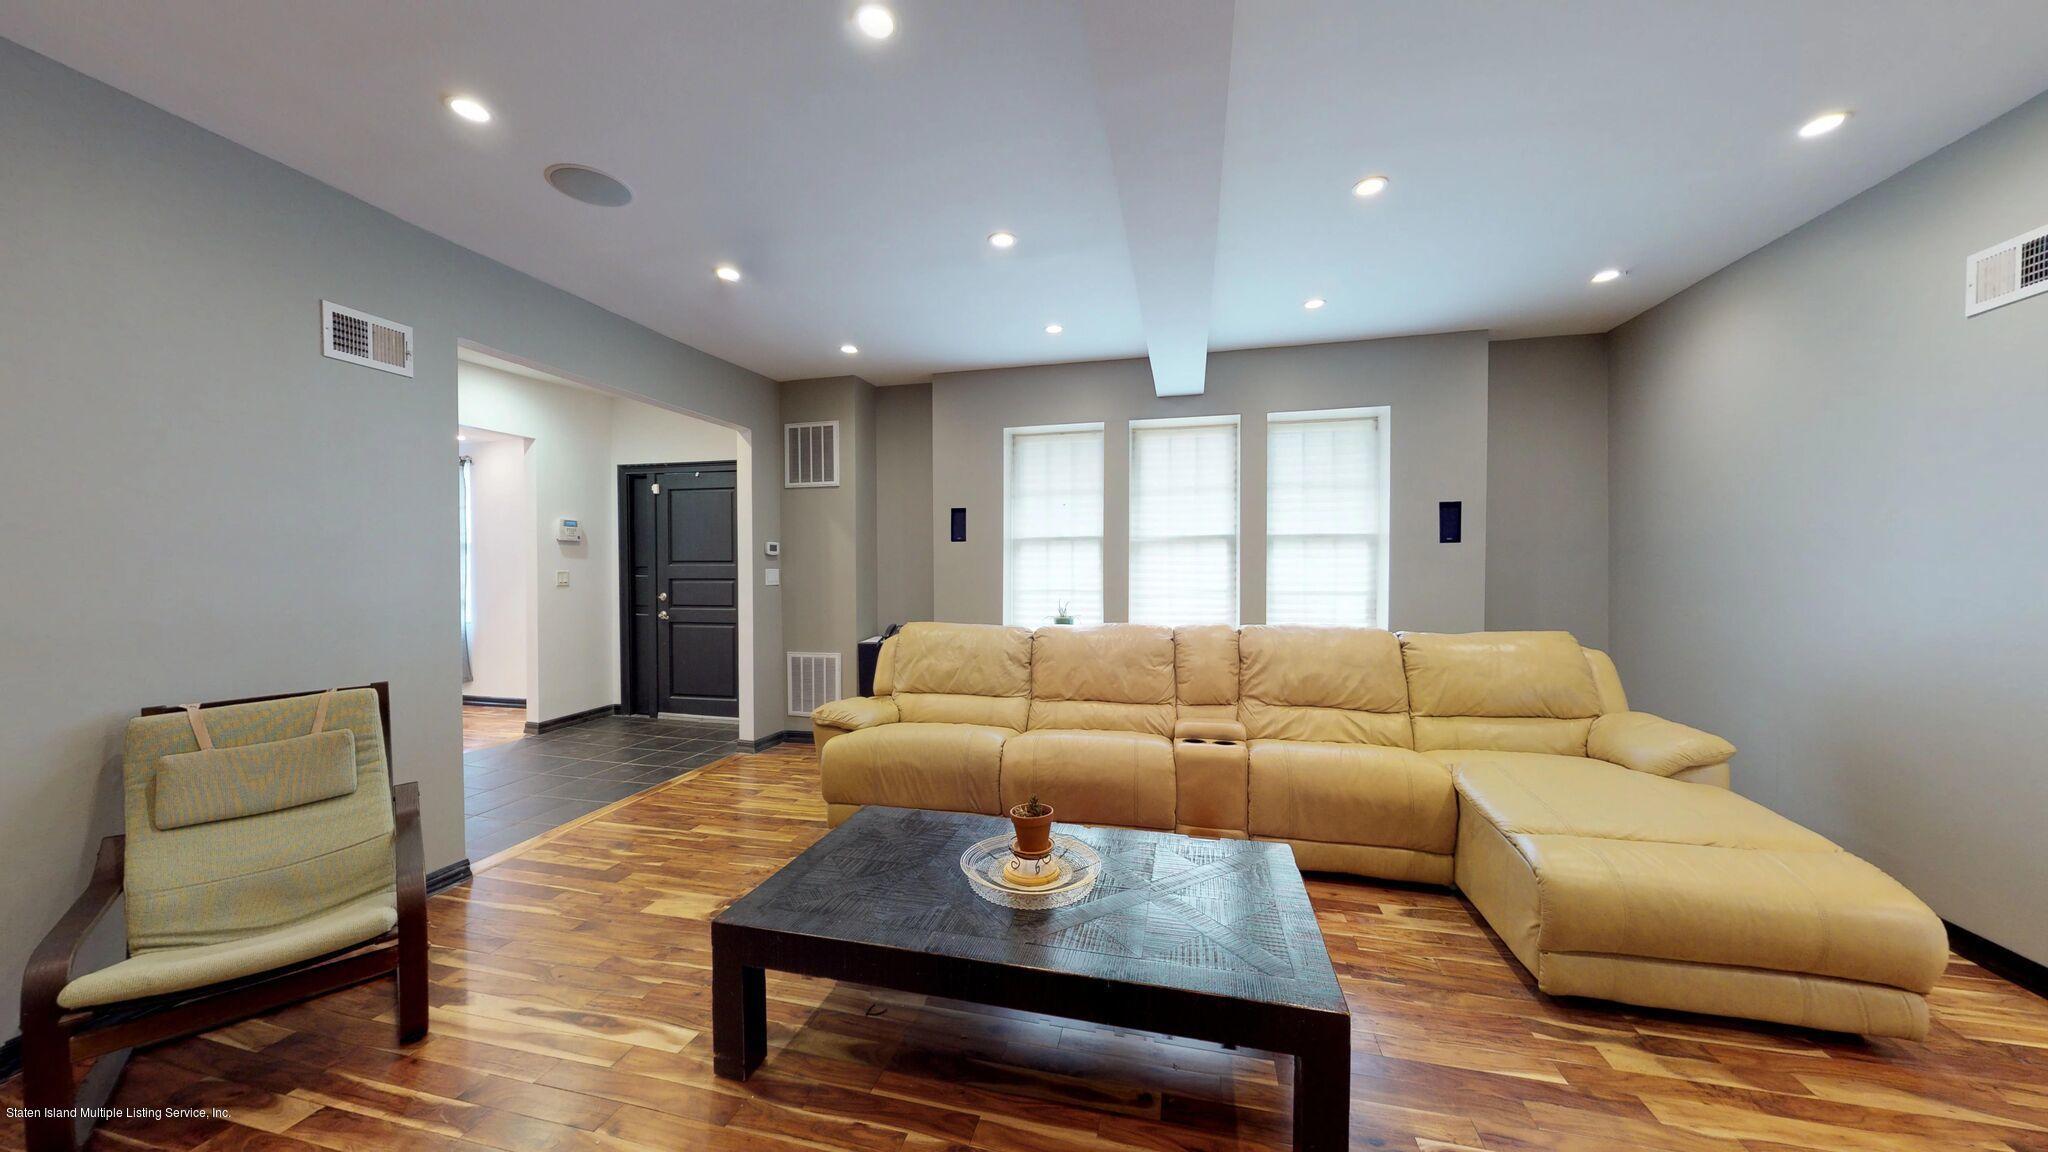 Single Family - Detached 128 Pelton Avenue  Staten Island, NY 10310, MLS-1124023-6